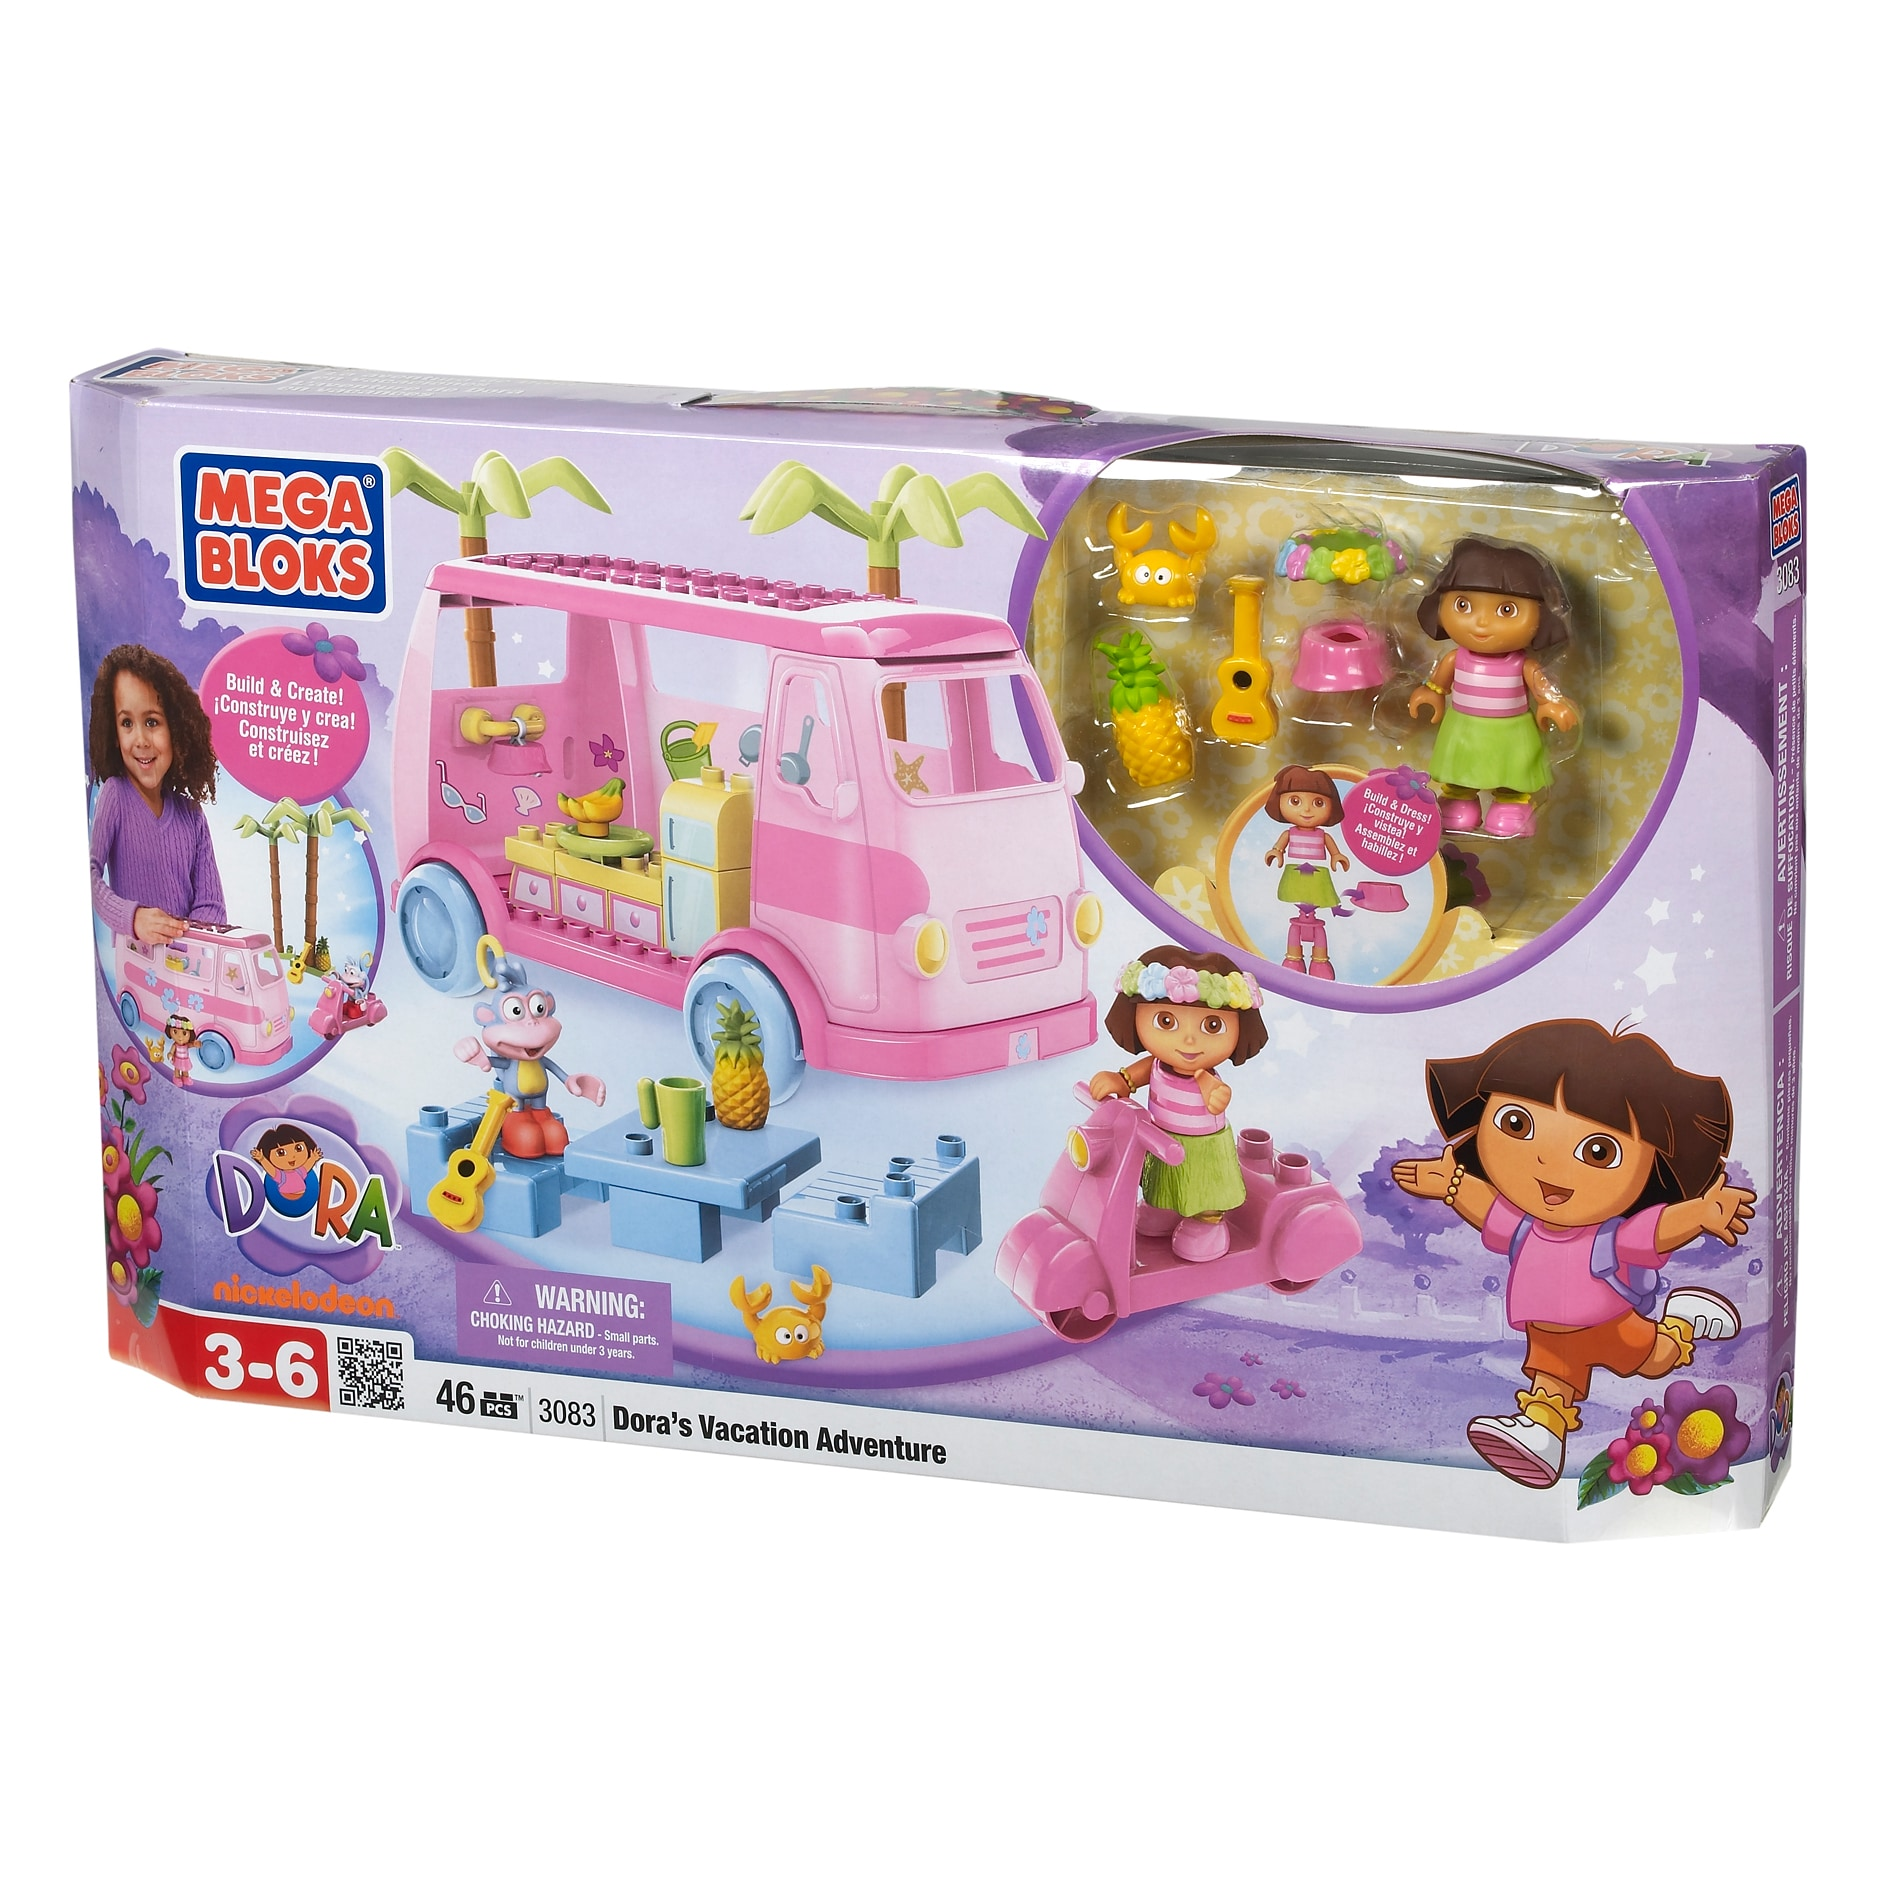 Mega Bloks Dora The Explorer Vacation Adventure Play Set